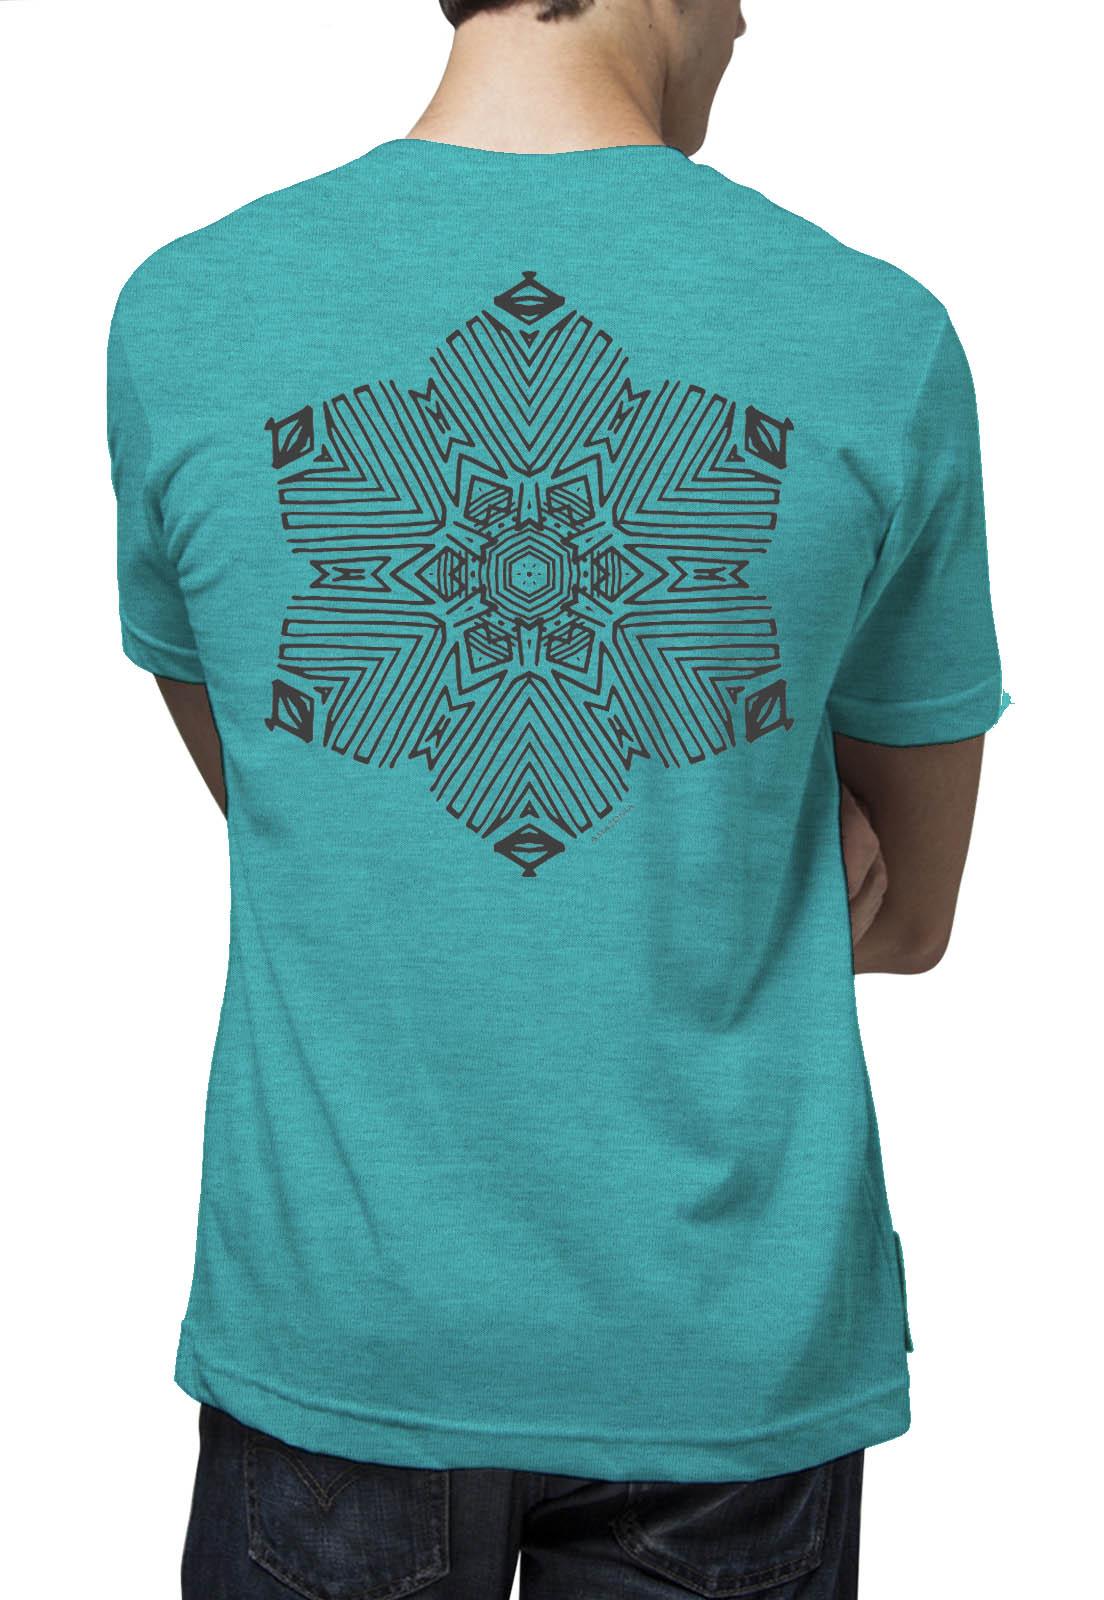 Camiseta Amazônia Flor Grafismo - Mescla Azul